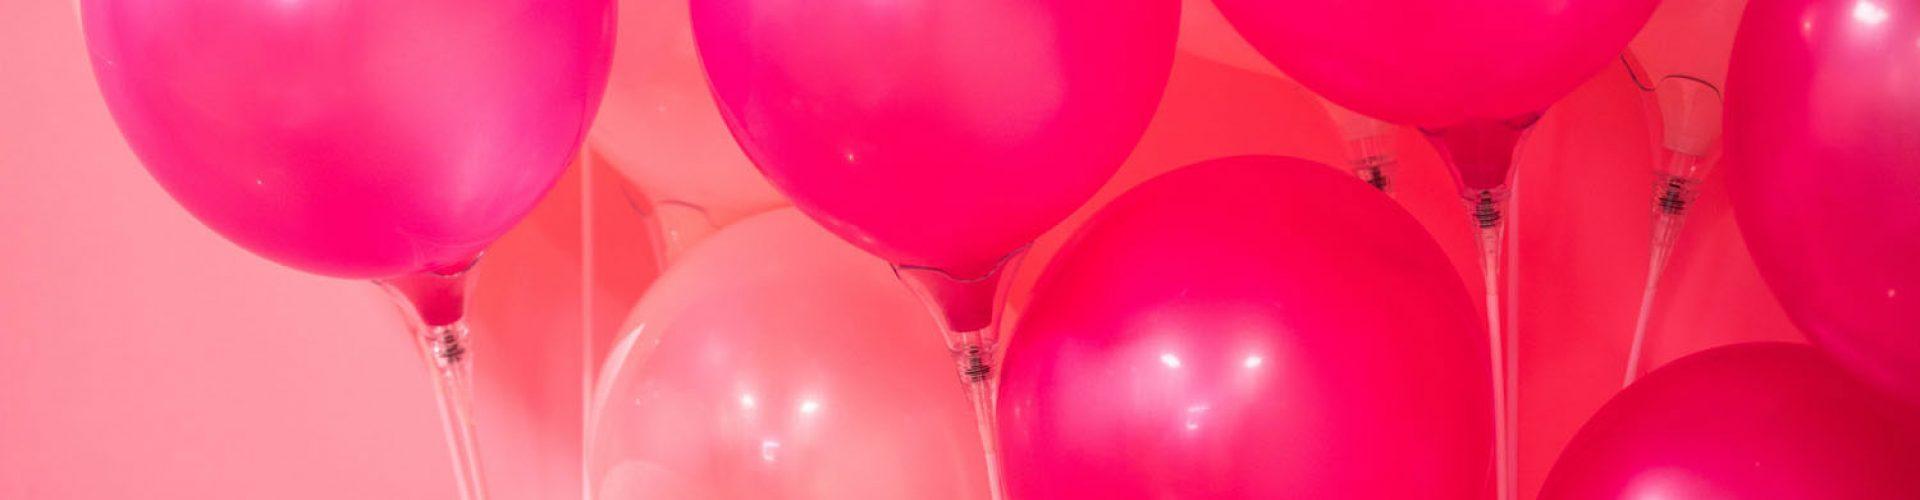 Luftballons pink